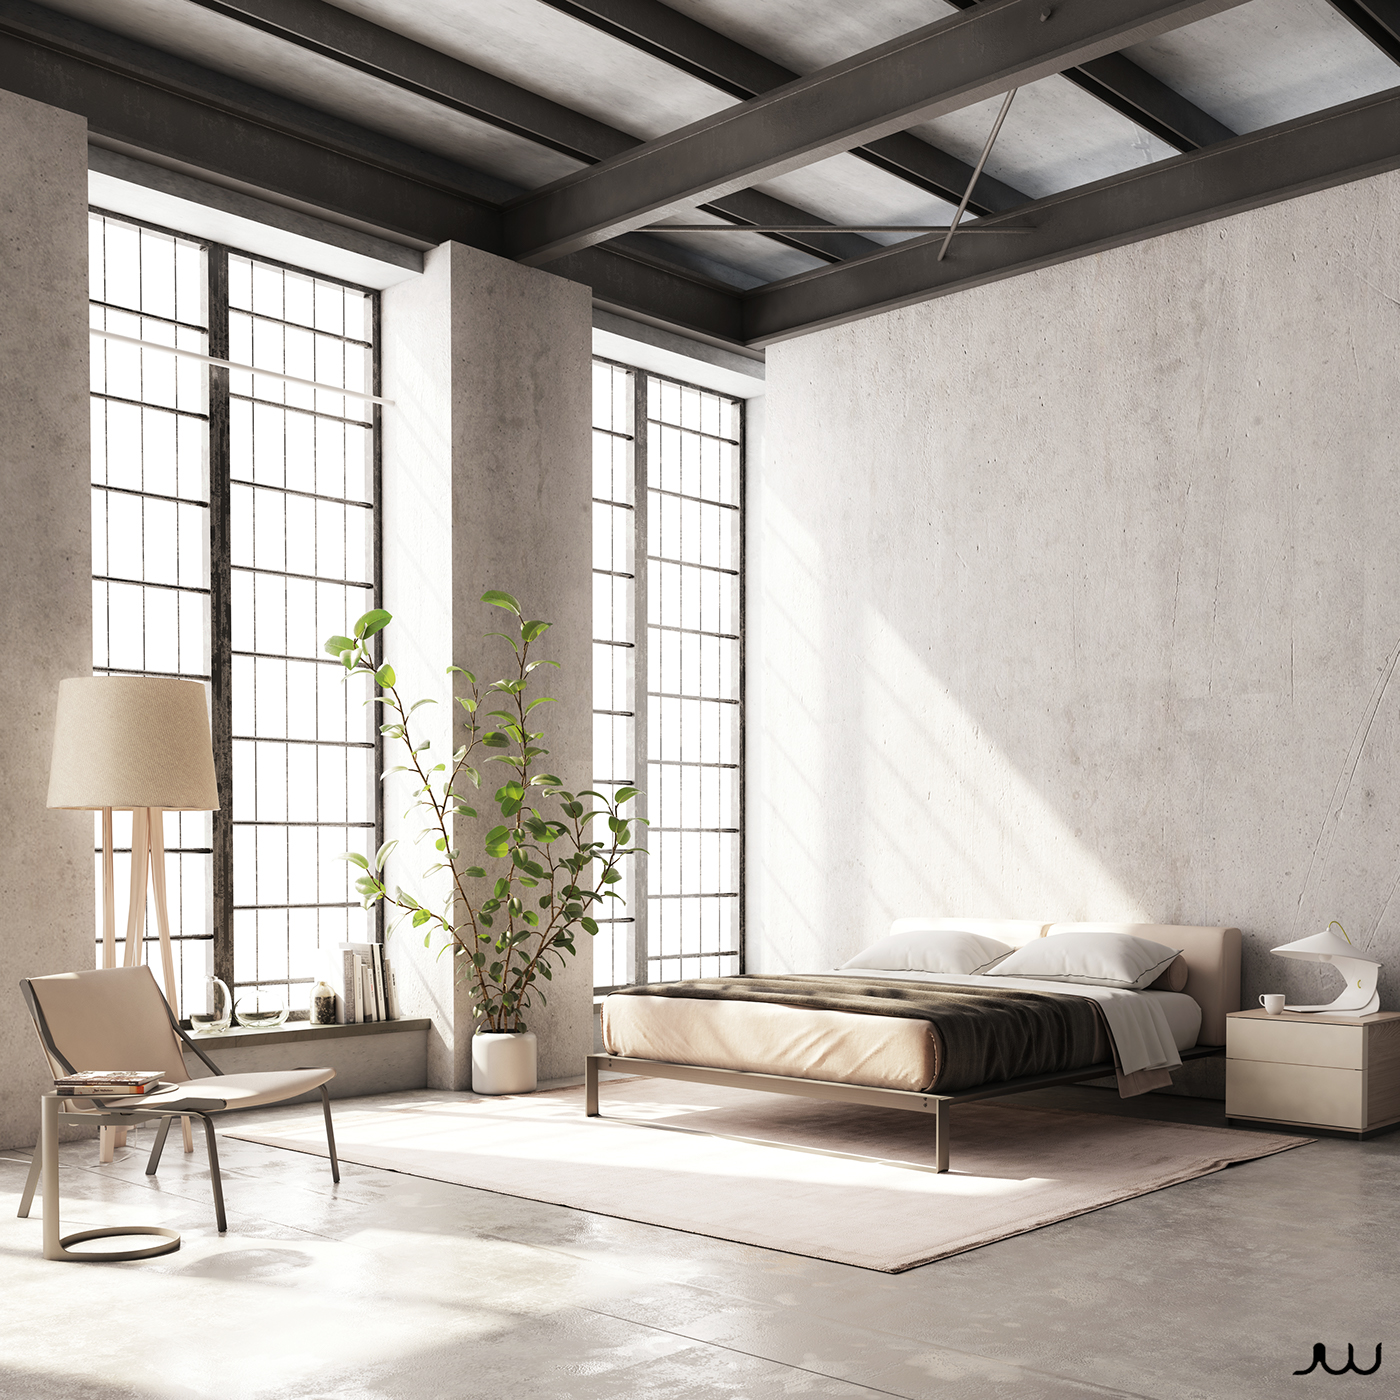 Set Furniture Renderings Federico Churba Designed On Behance # Muebles Federico Churba